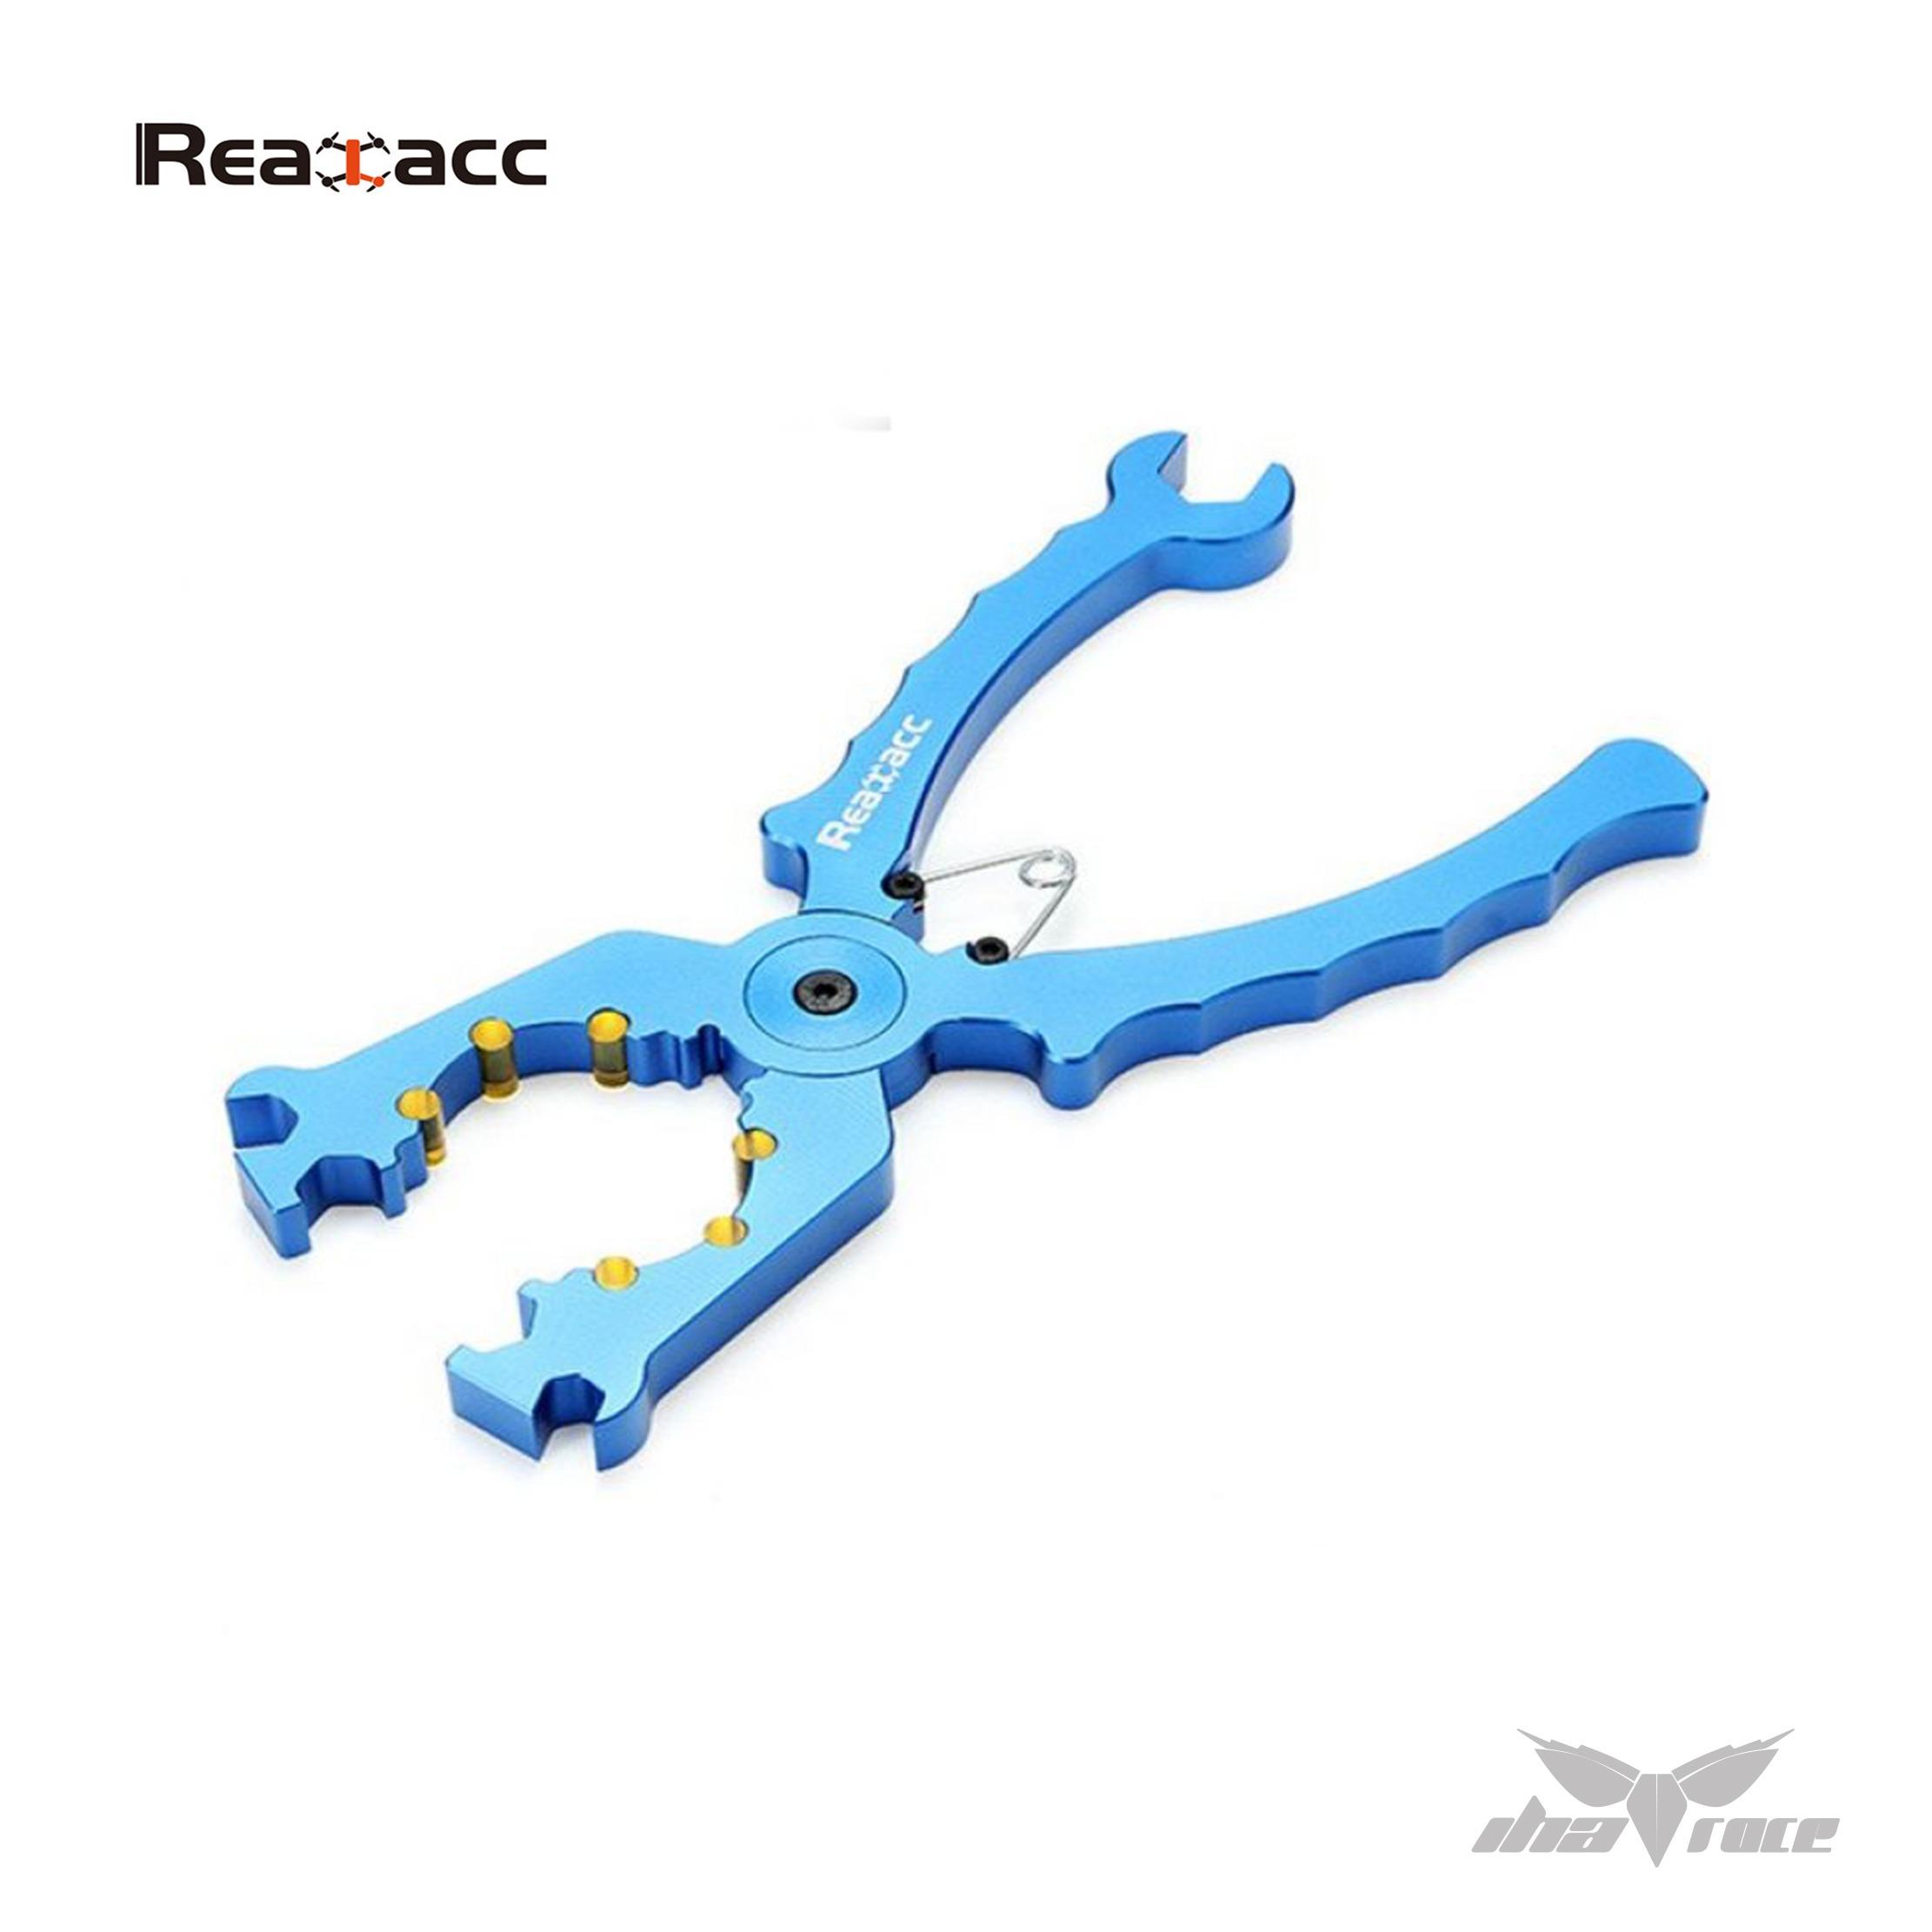 Alicates Realacc Multi Función para motor RC